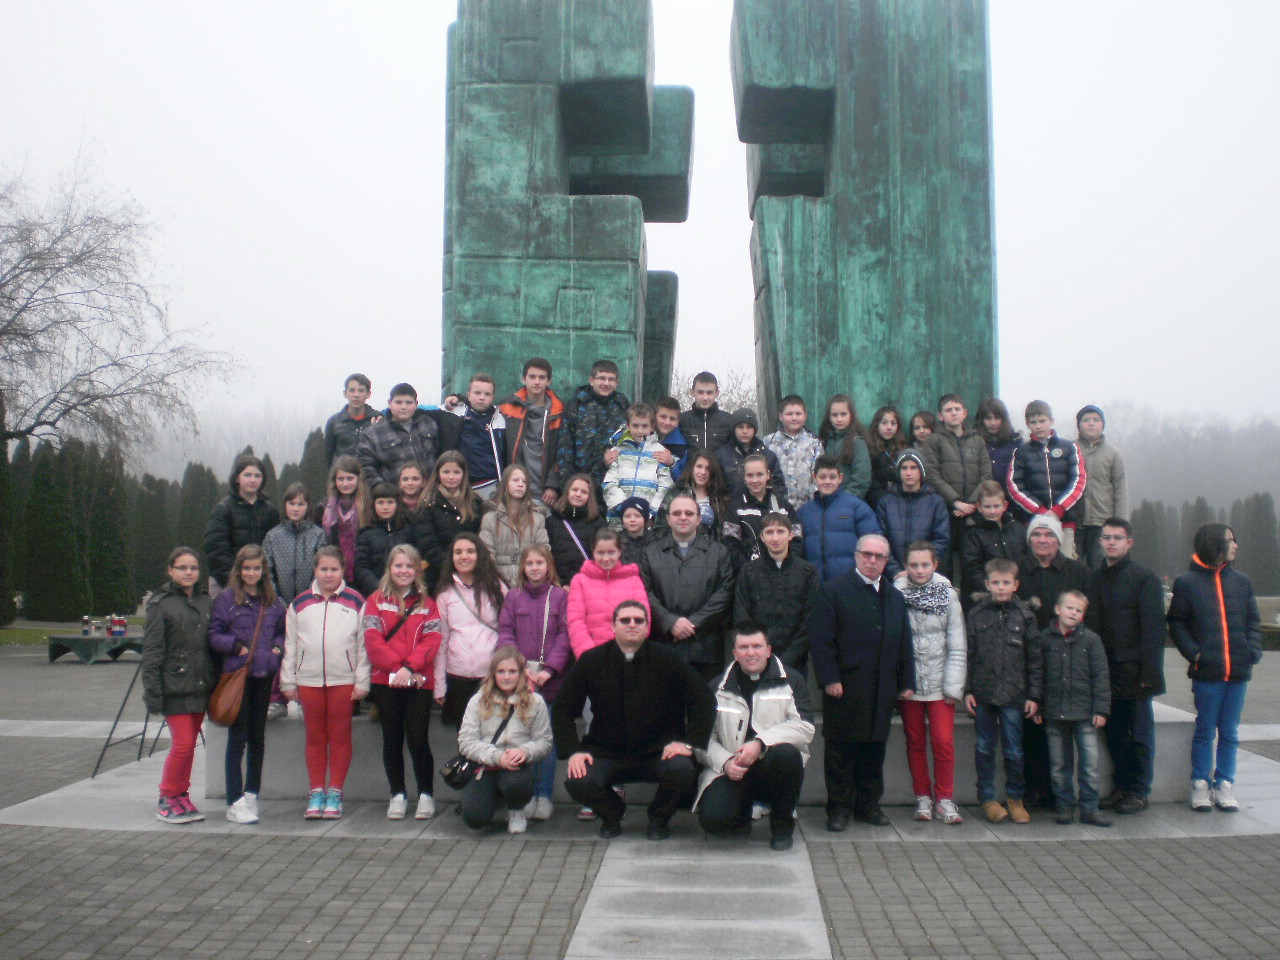 Ministrantsko hodočašće u Vukovar - 7.1.2014.